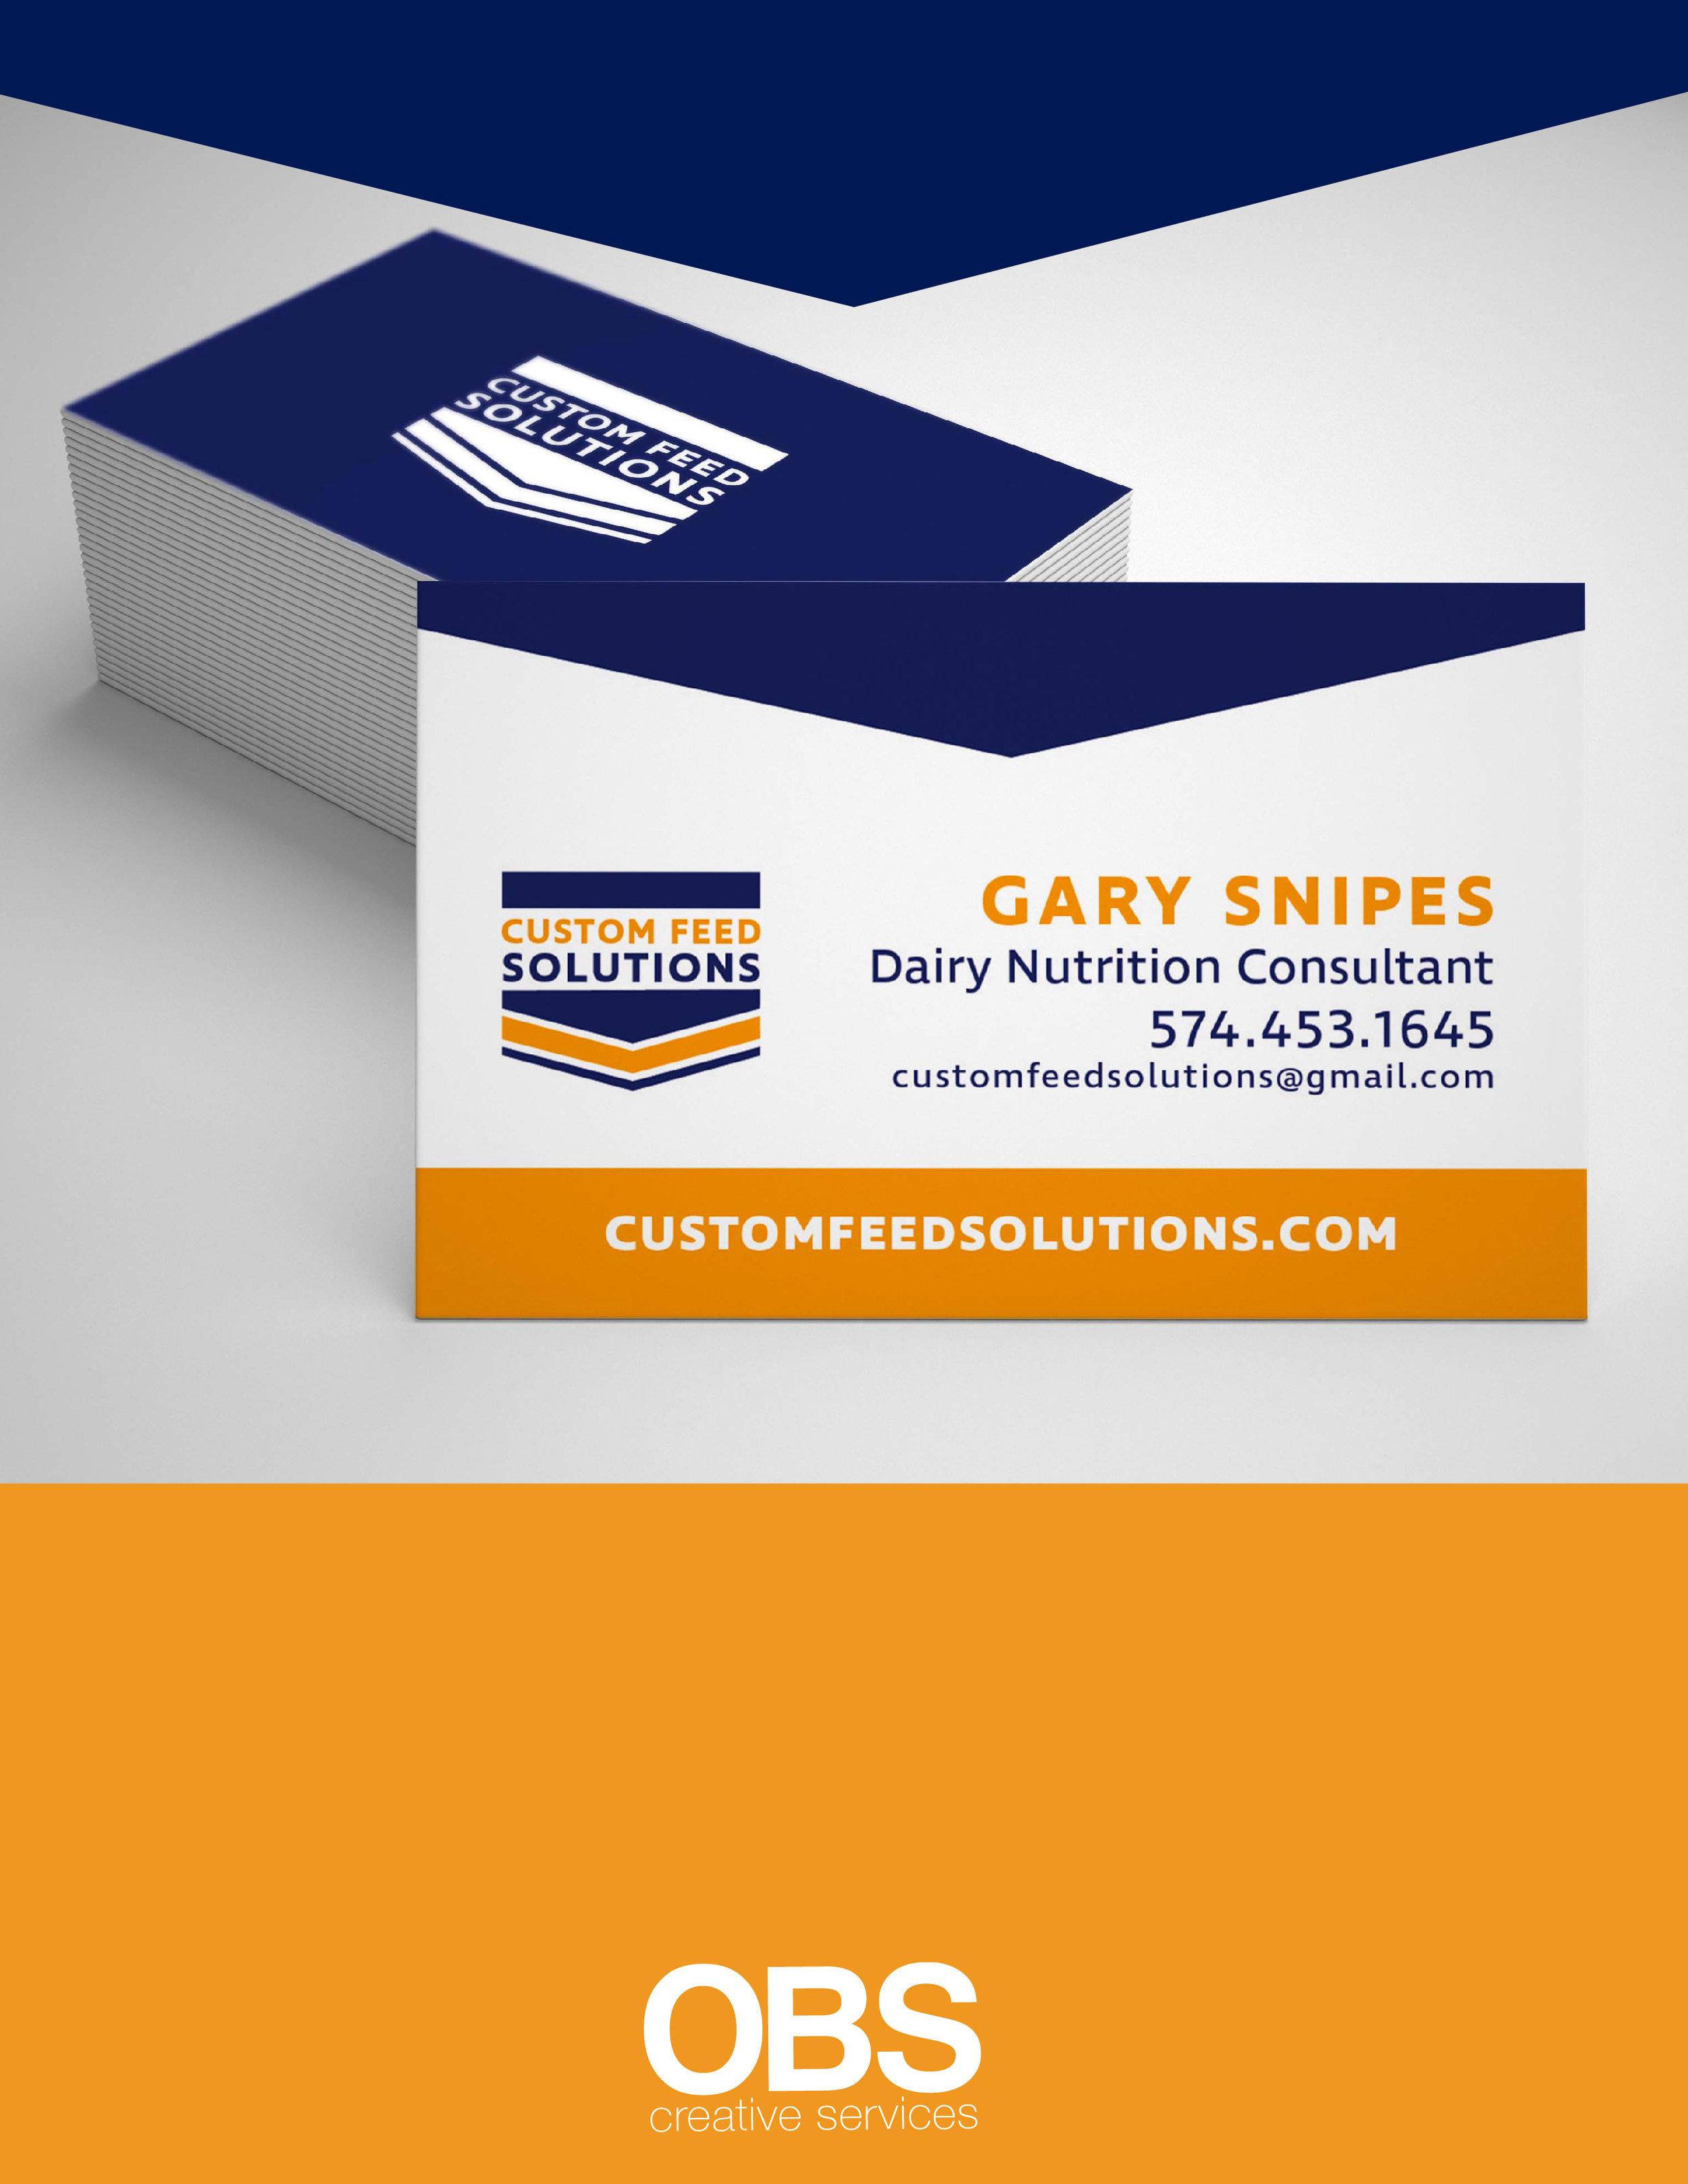 Custom Feed Solutions Business Card@300x-100.jpg